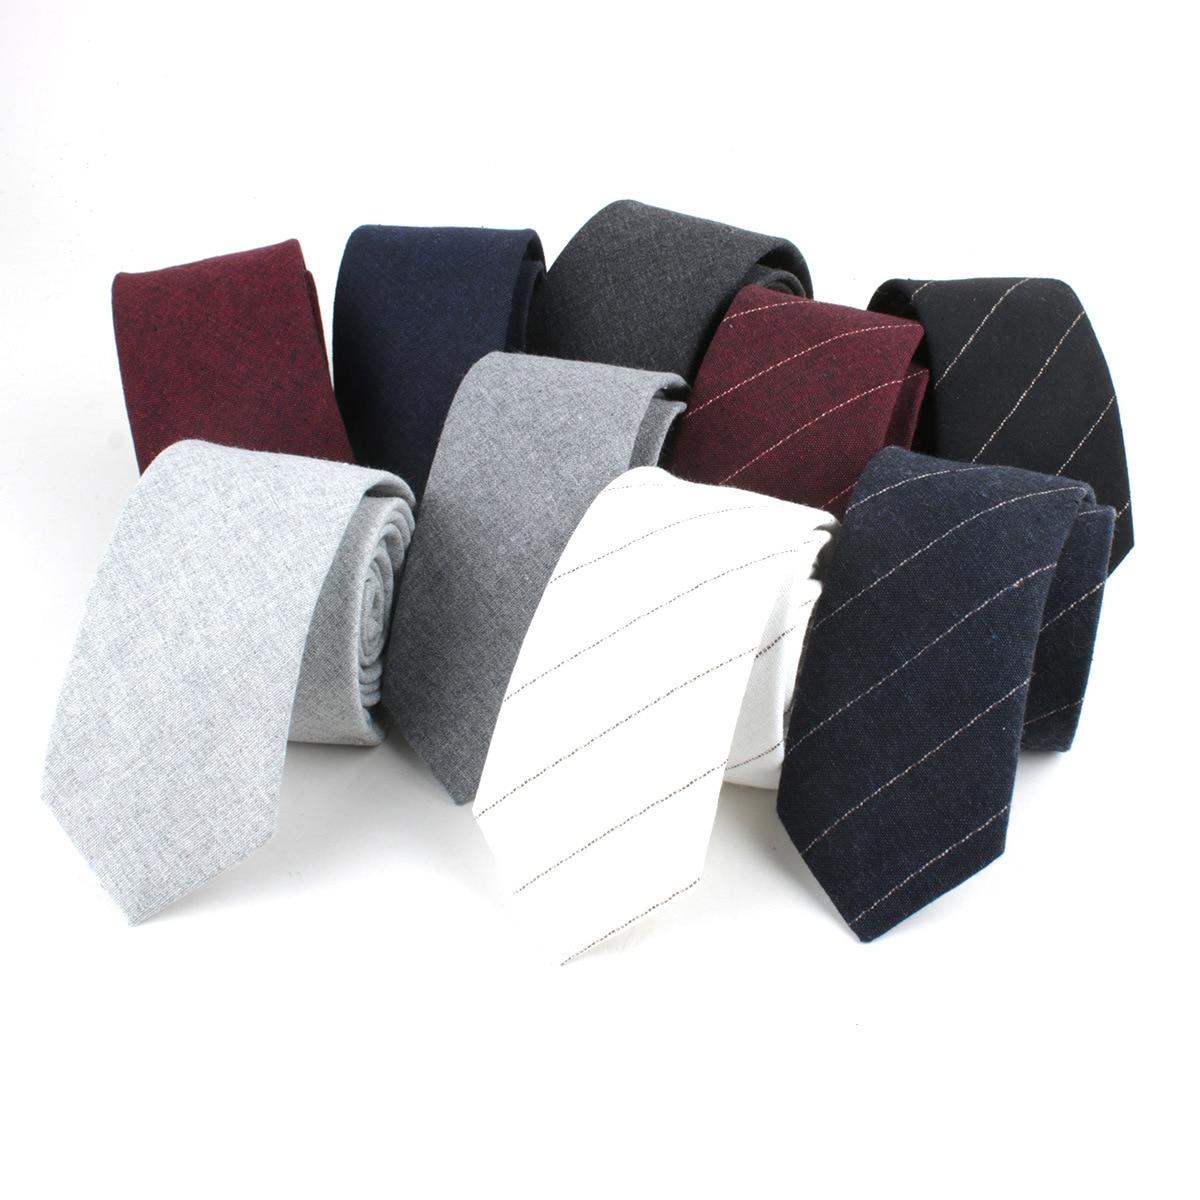 2019 Brand New Men's Fashion Vintage Solid Neck Ties For Man Stripe Red Blue Wedding Business Slim Necktie Corbatas Skinny Tie